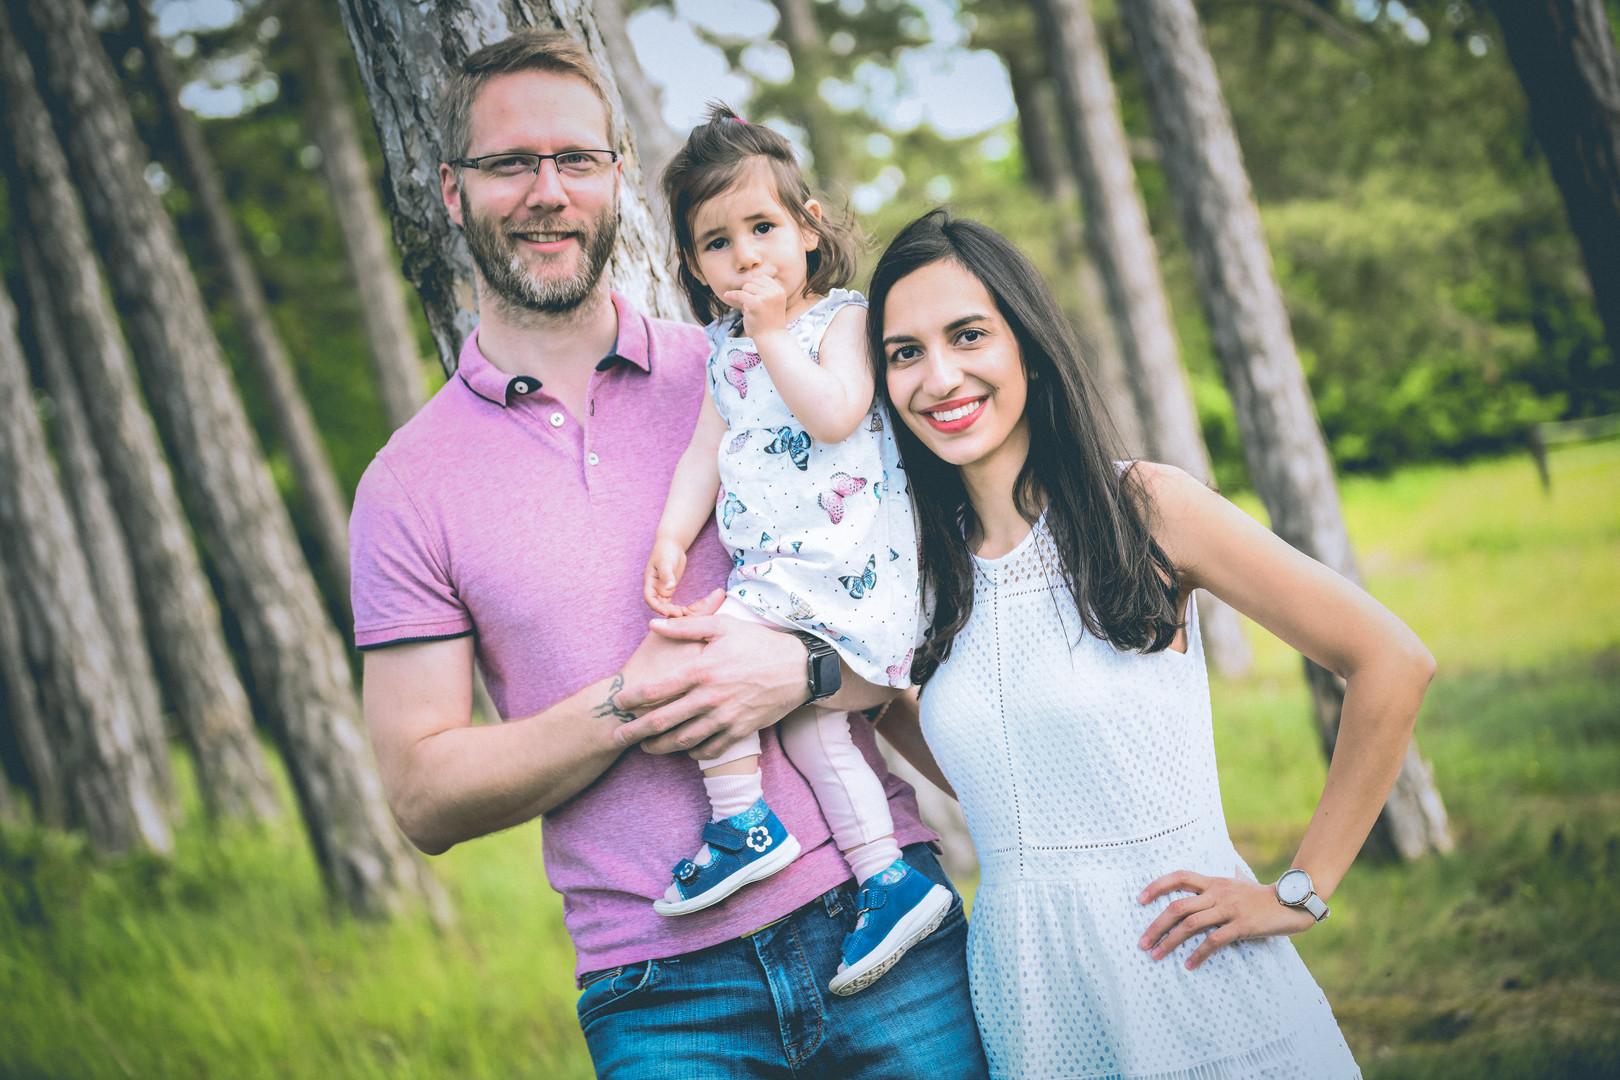 Familienfotos_Kreuznach_Nies